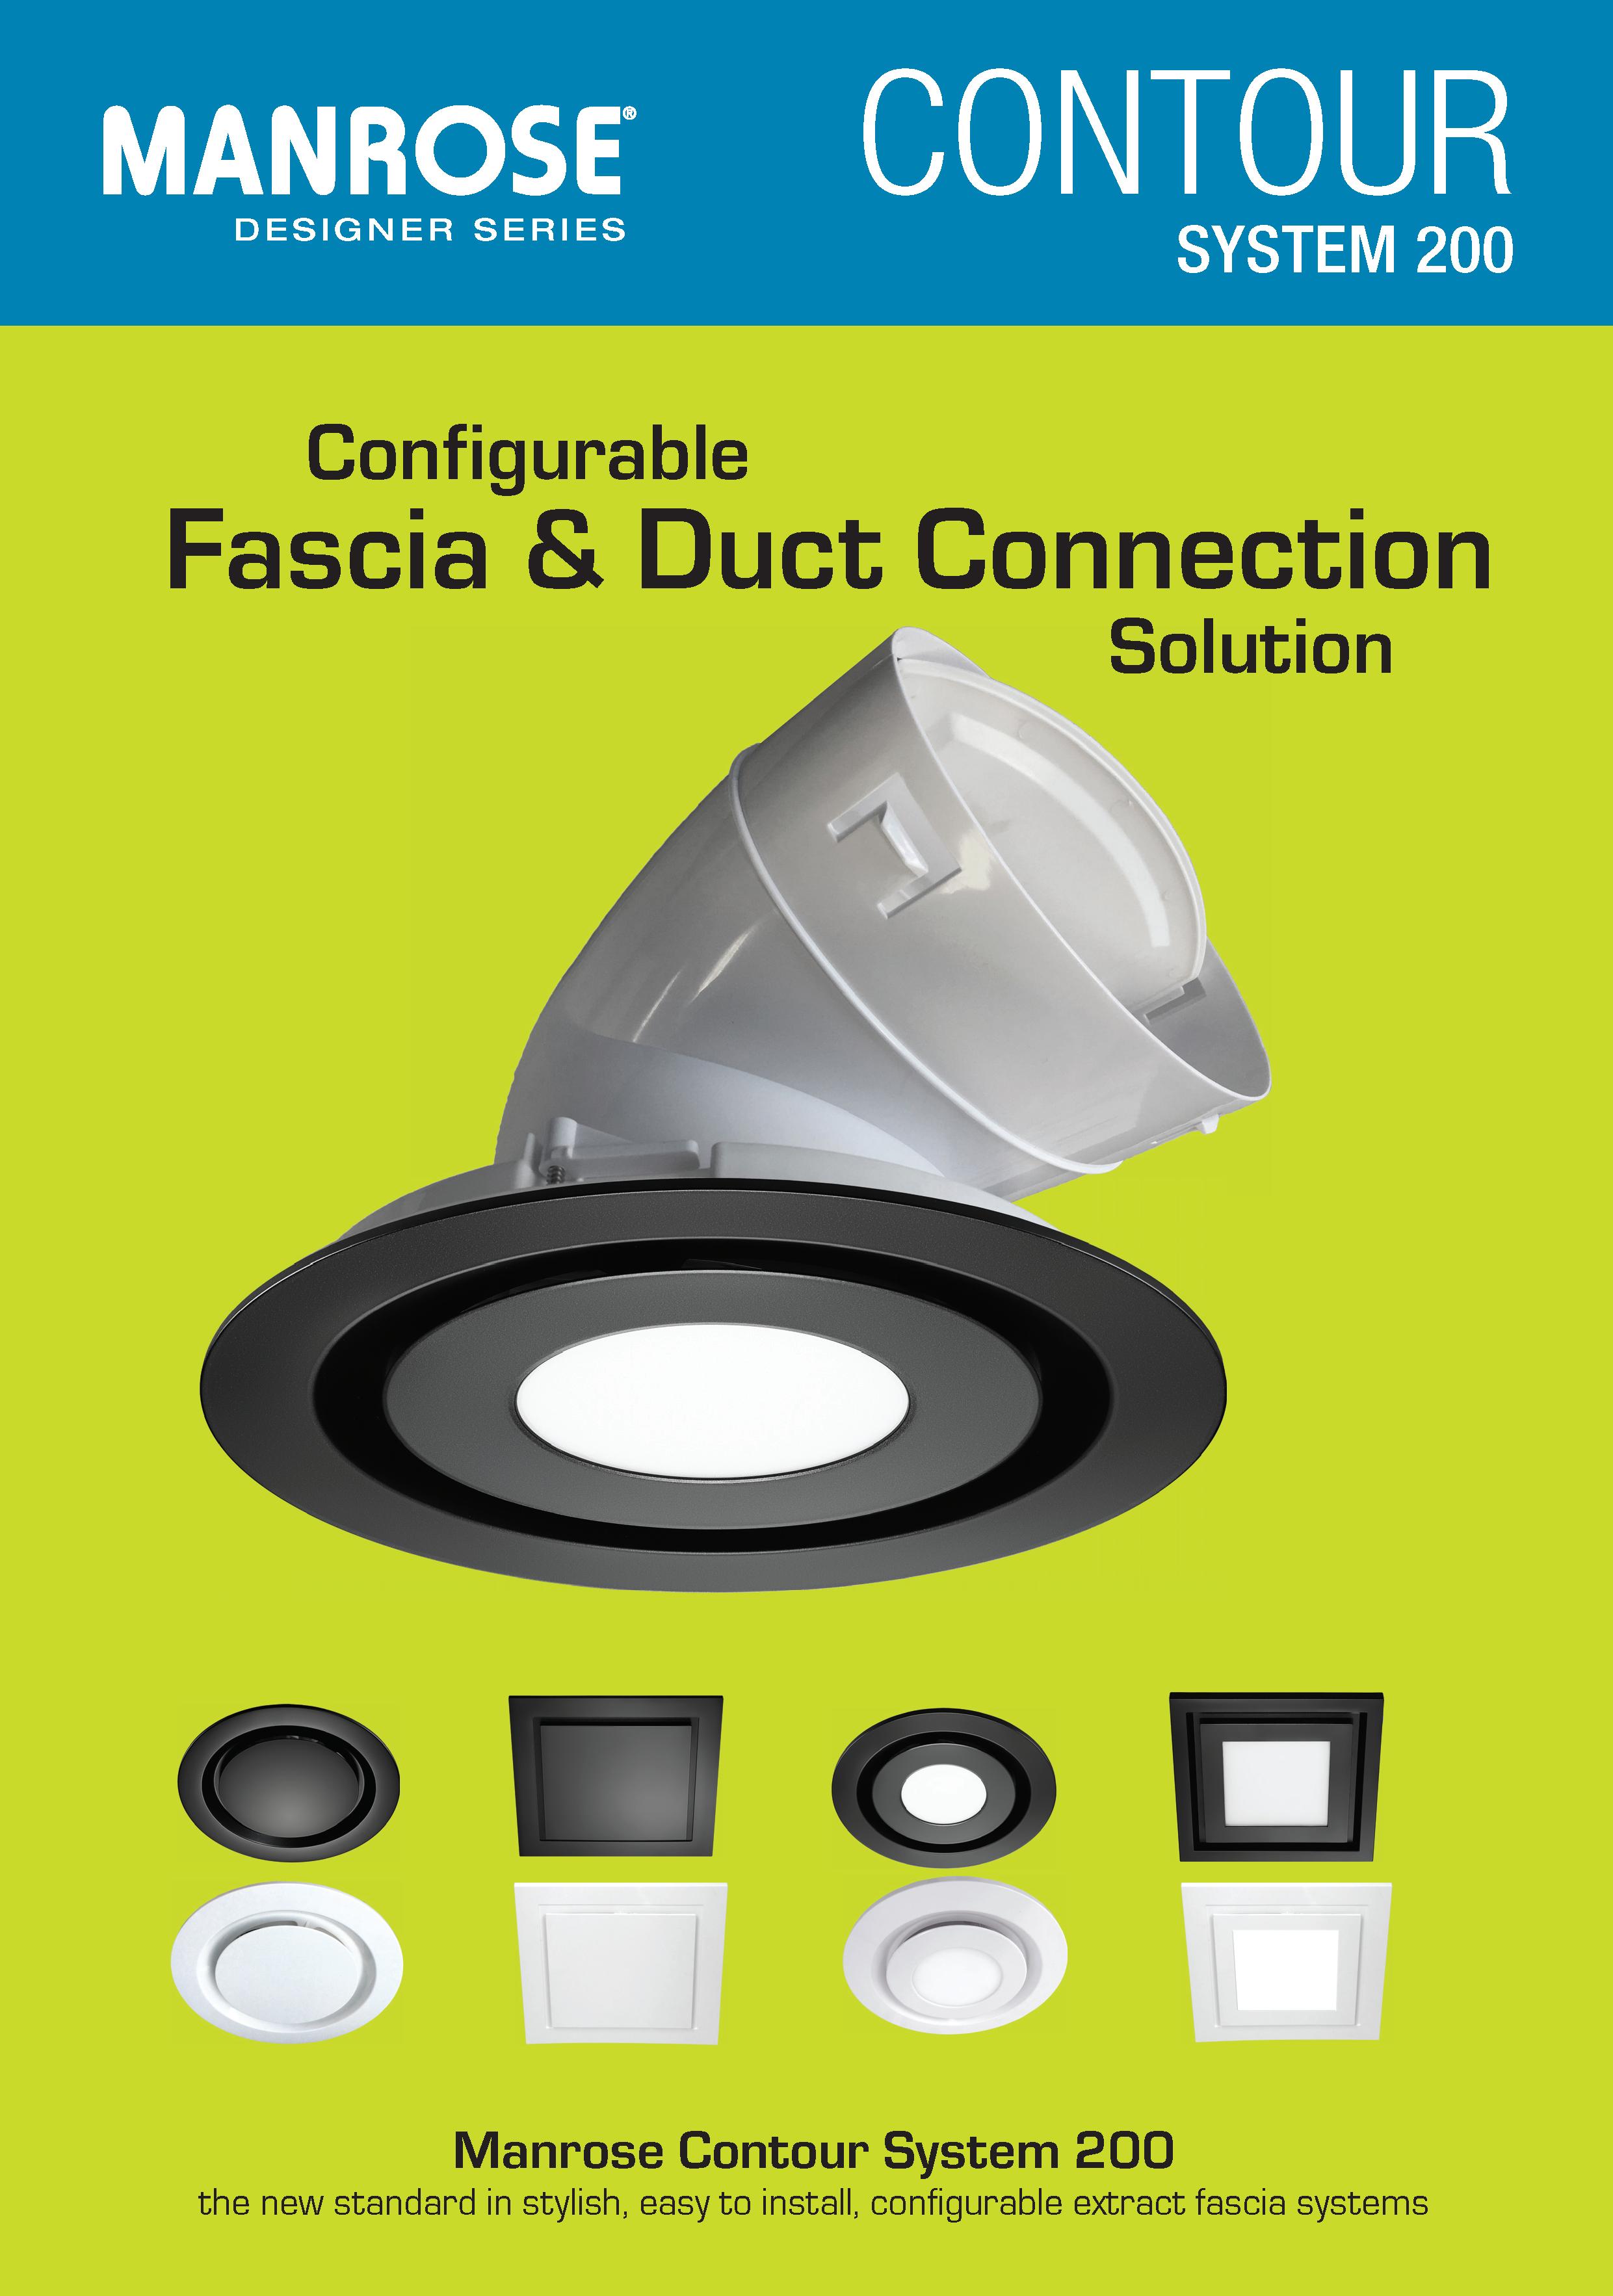 Contour System 200